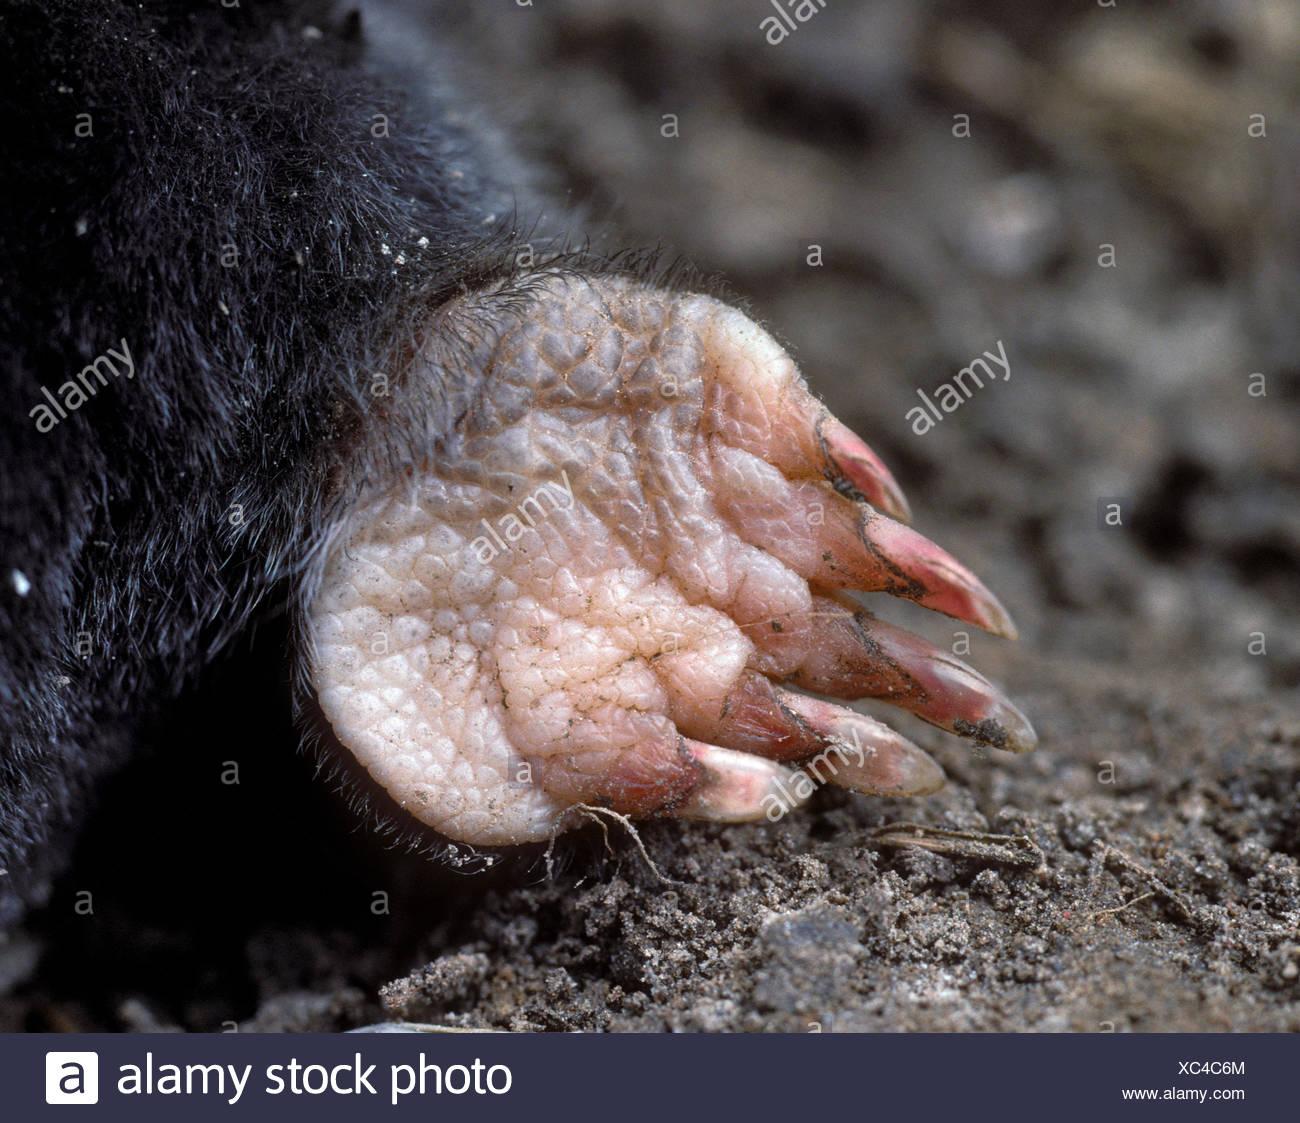 Mole - Talpa europaea - Stock Image